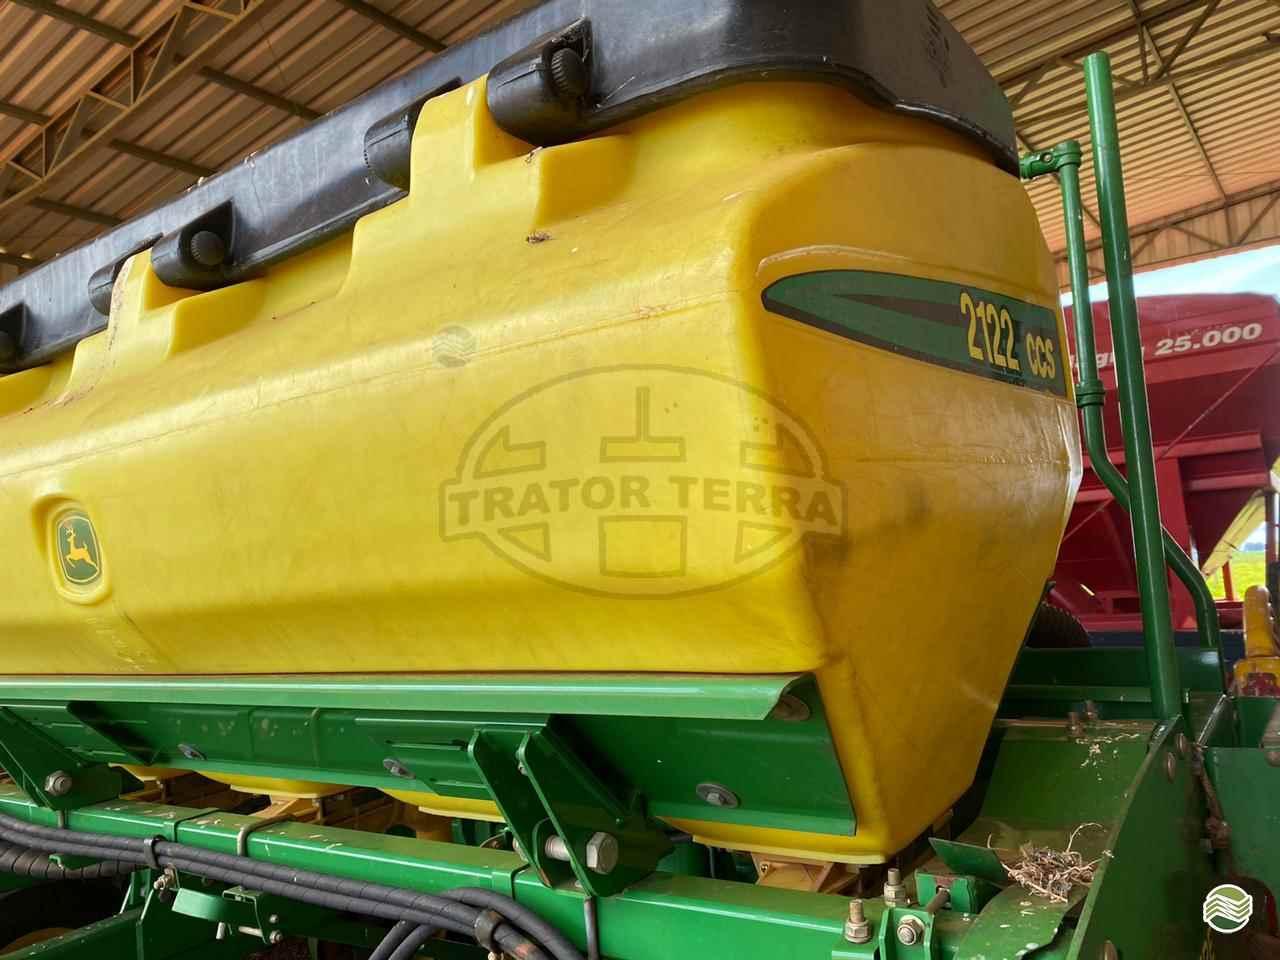 JOHN DEERE PLANTADEIRAS 2122  2015/2015 Trator Terra - Jatai